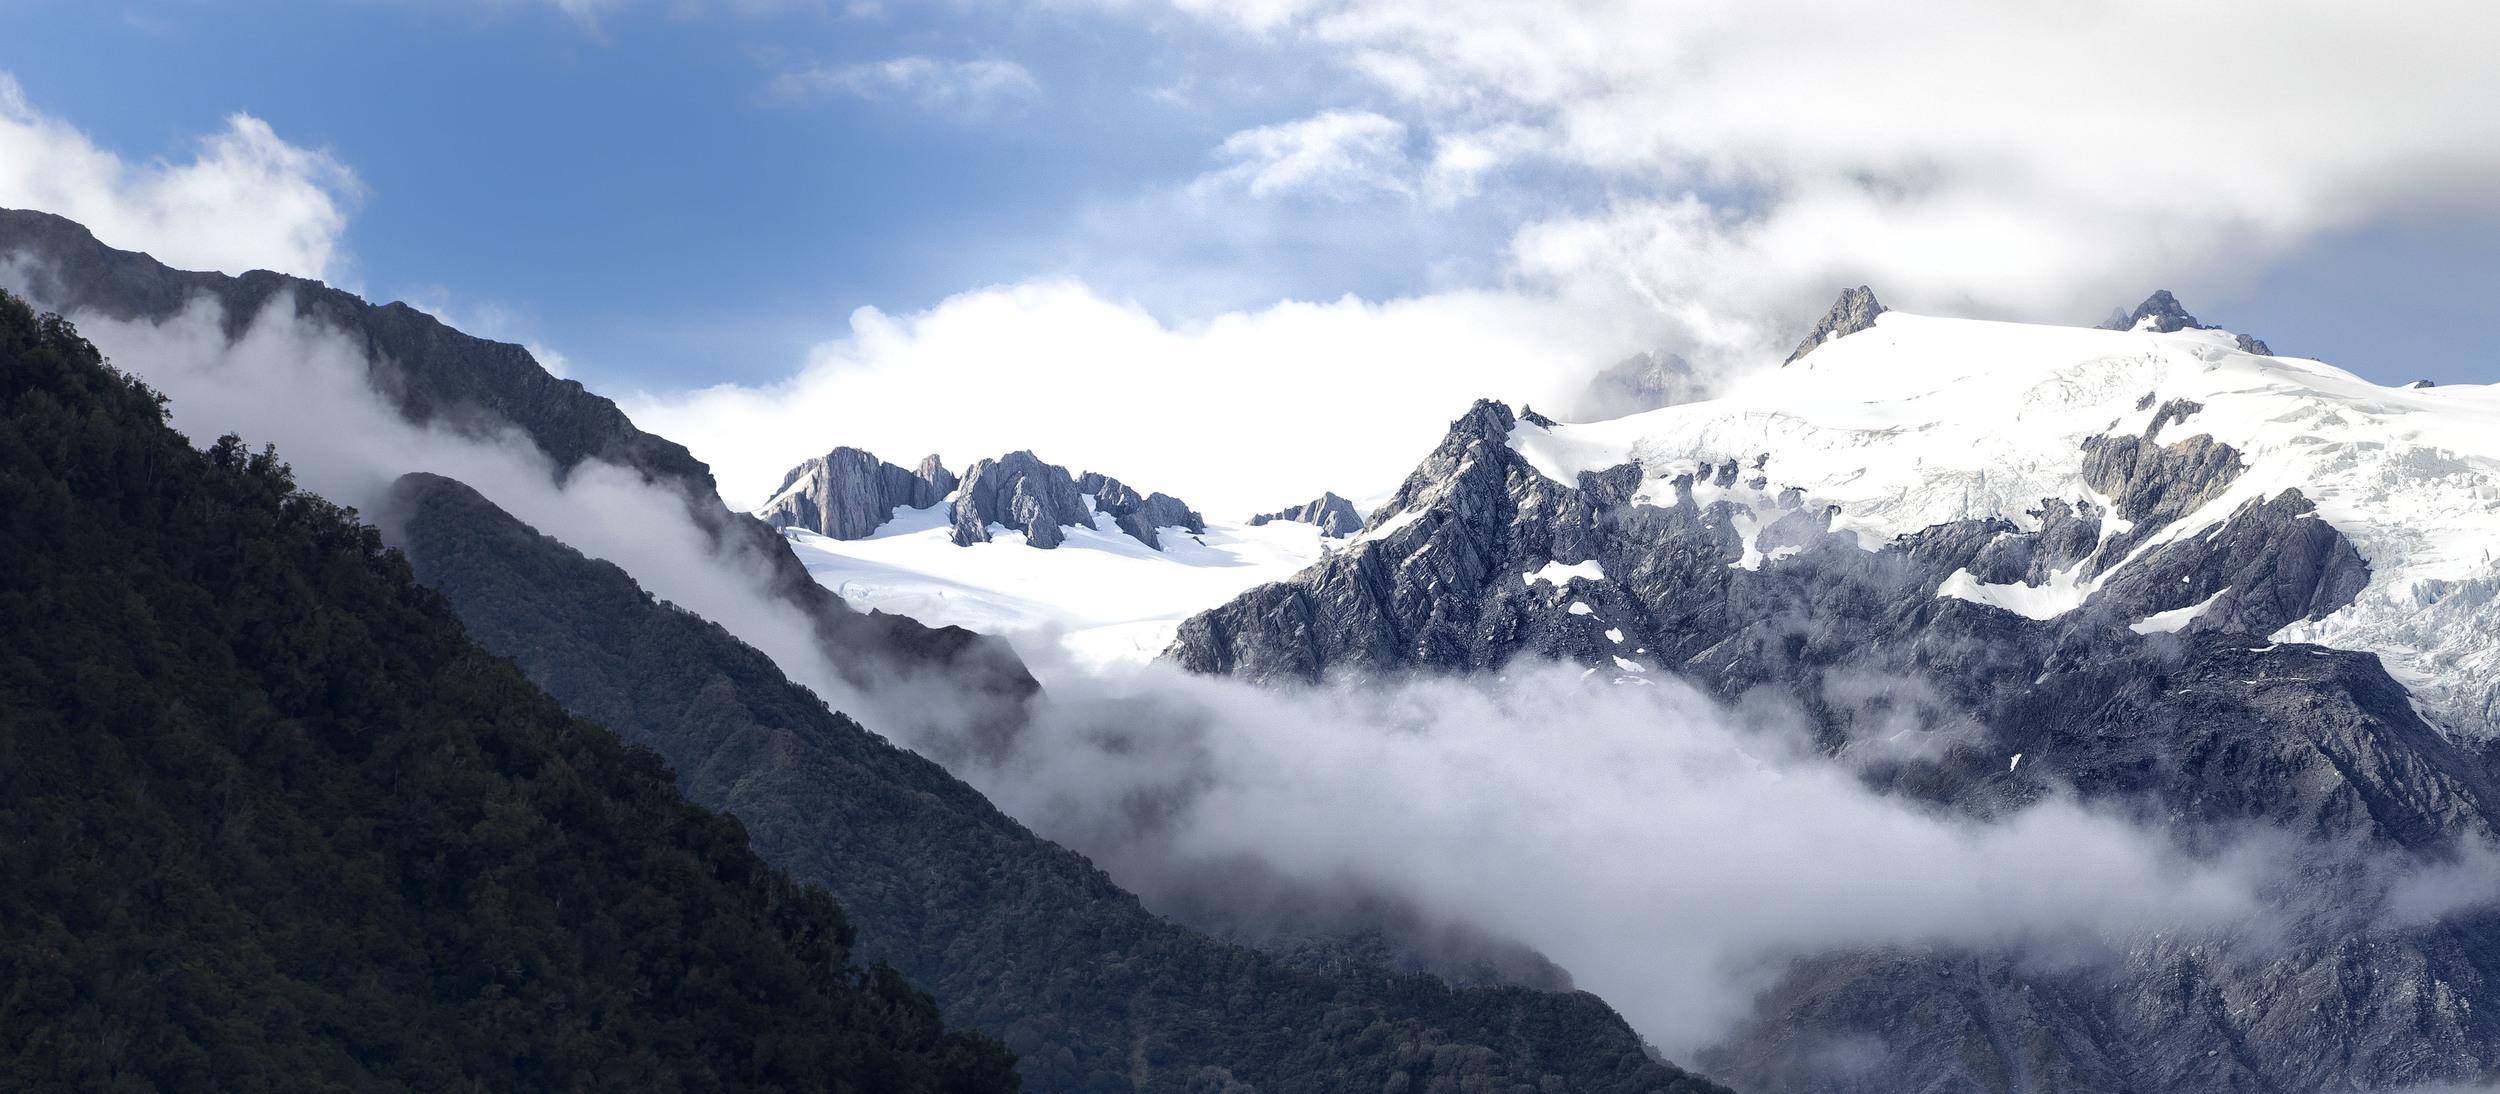 Aoraki/Mount Cook National Park New Zealand